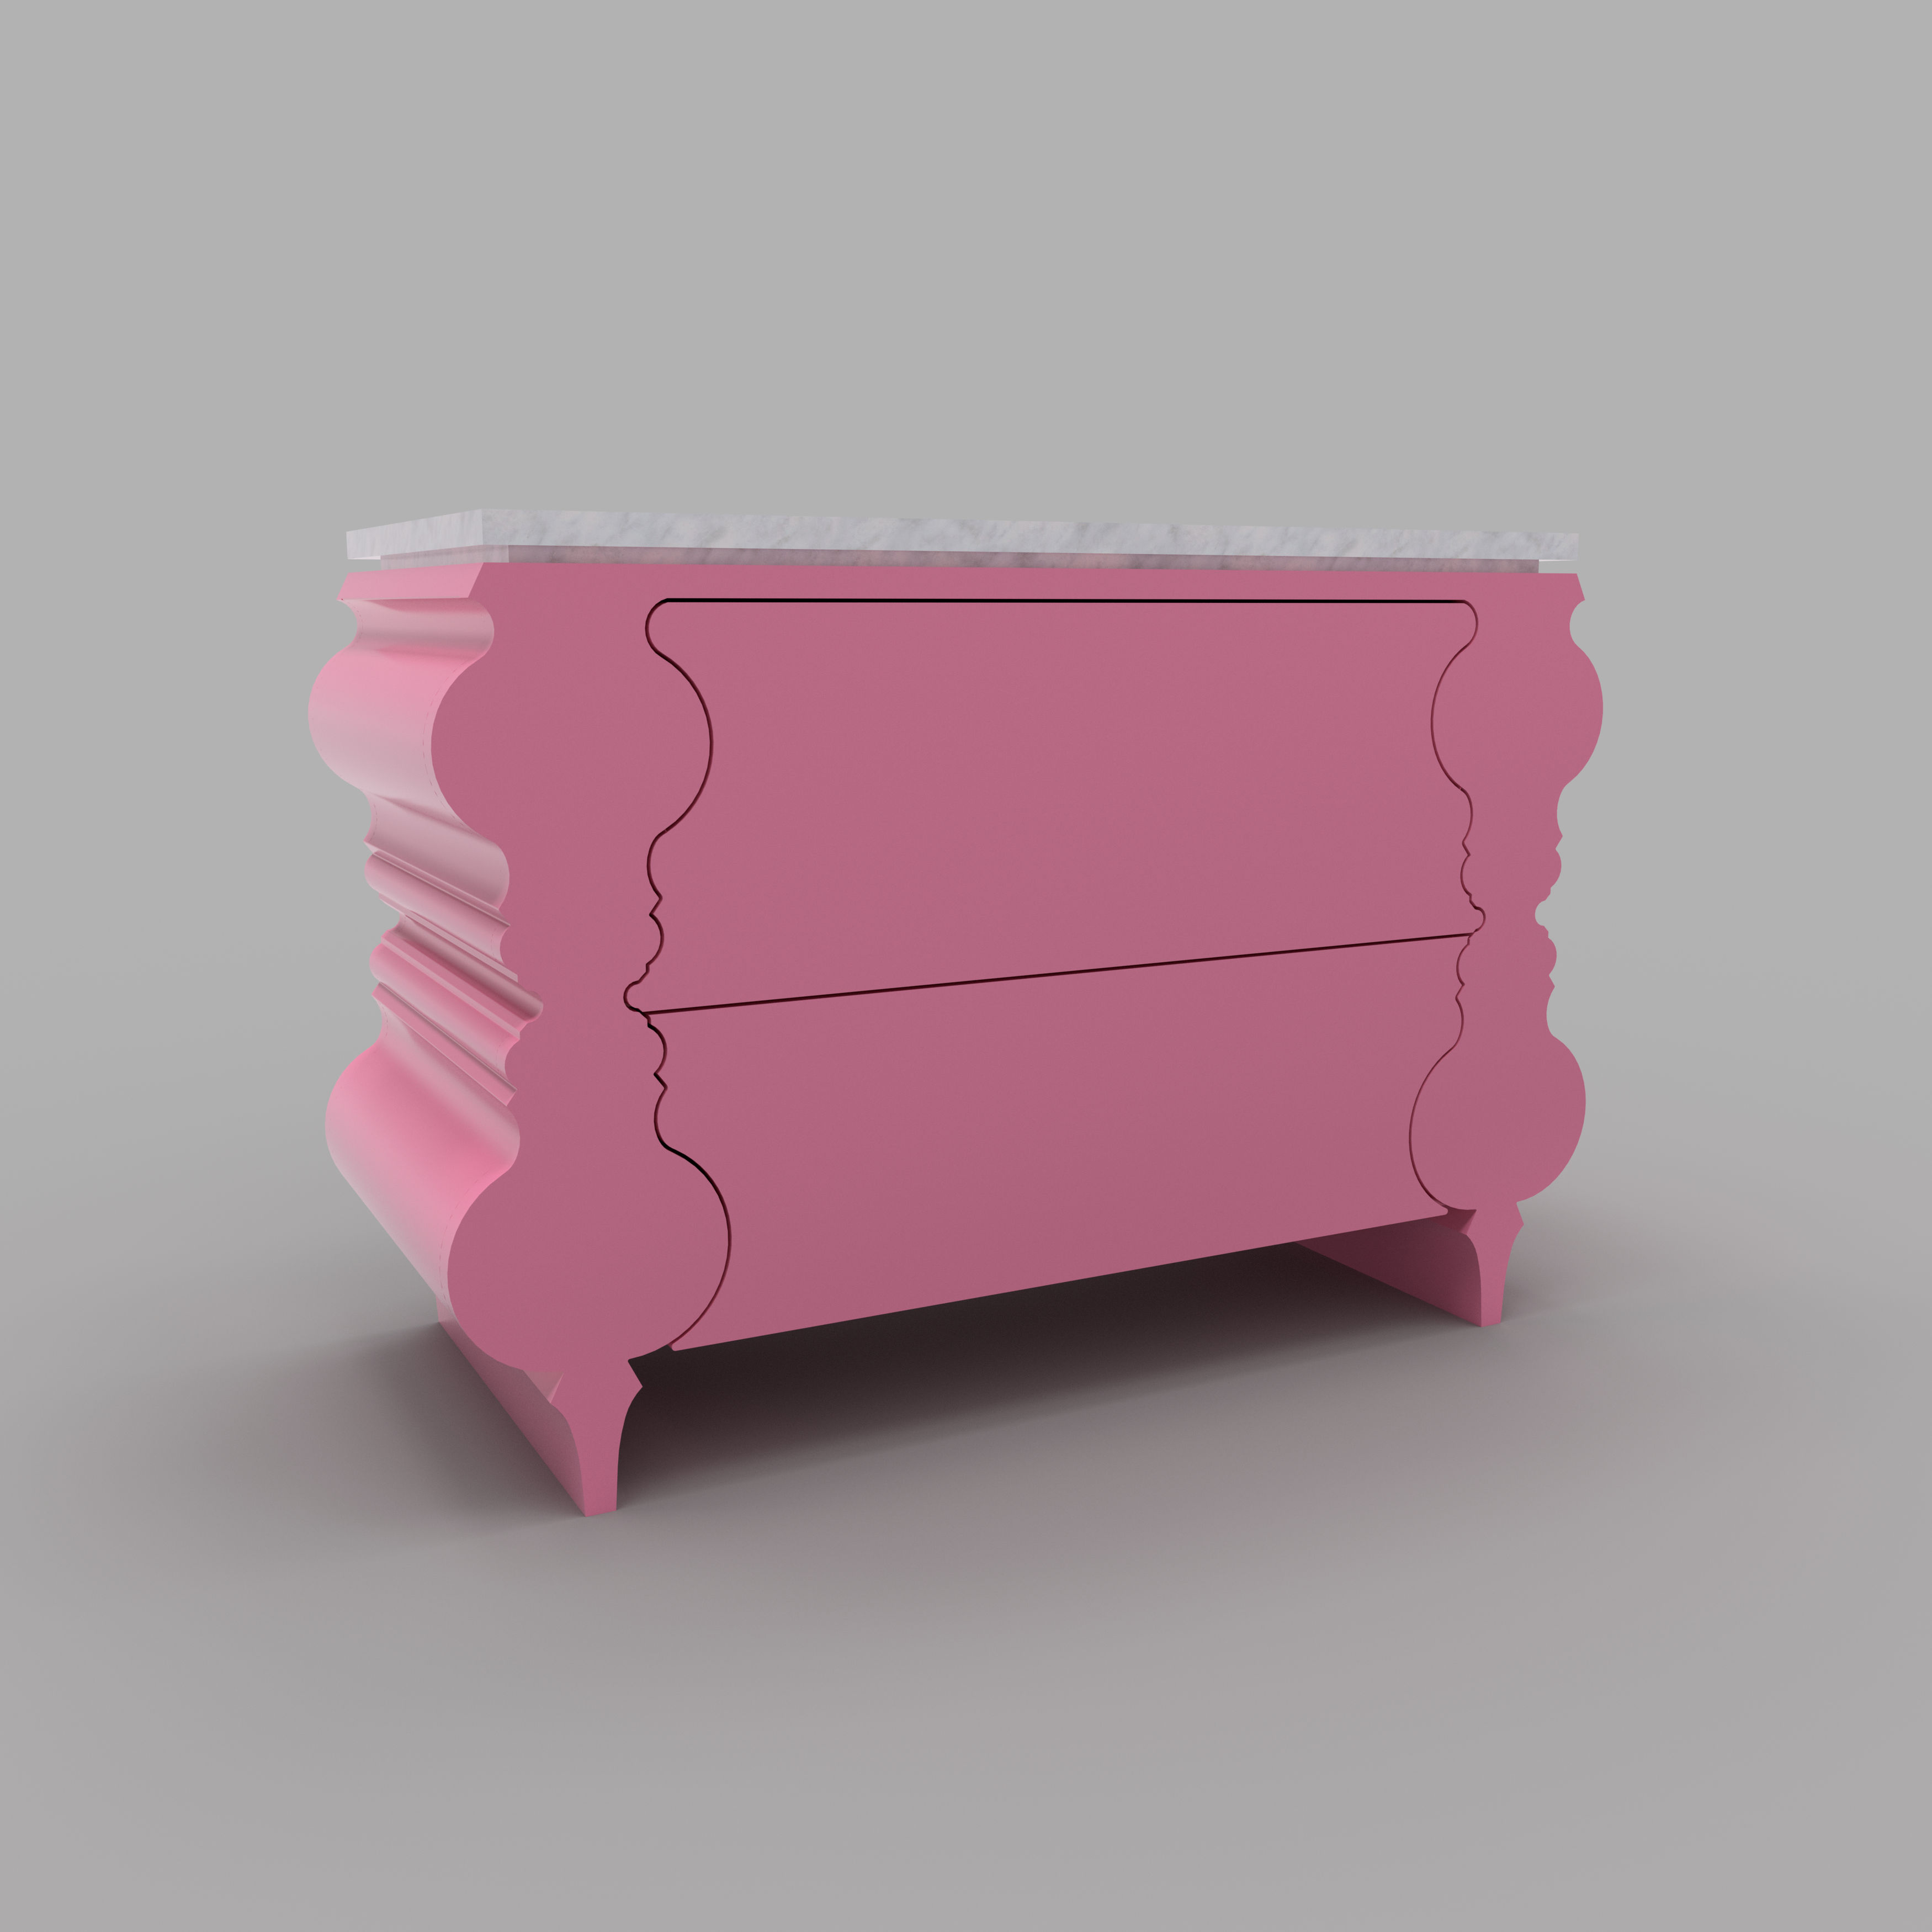 Dresser-1-3500-3500